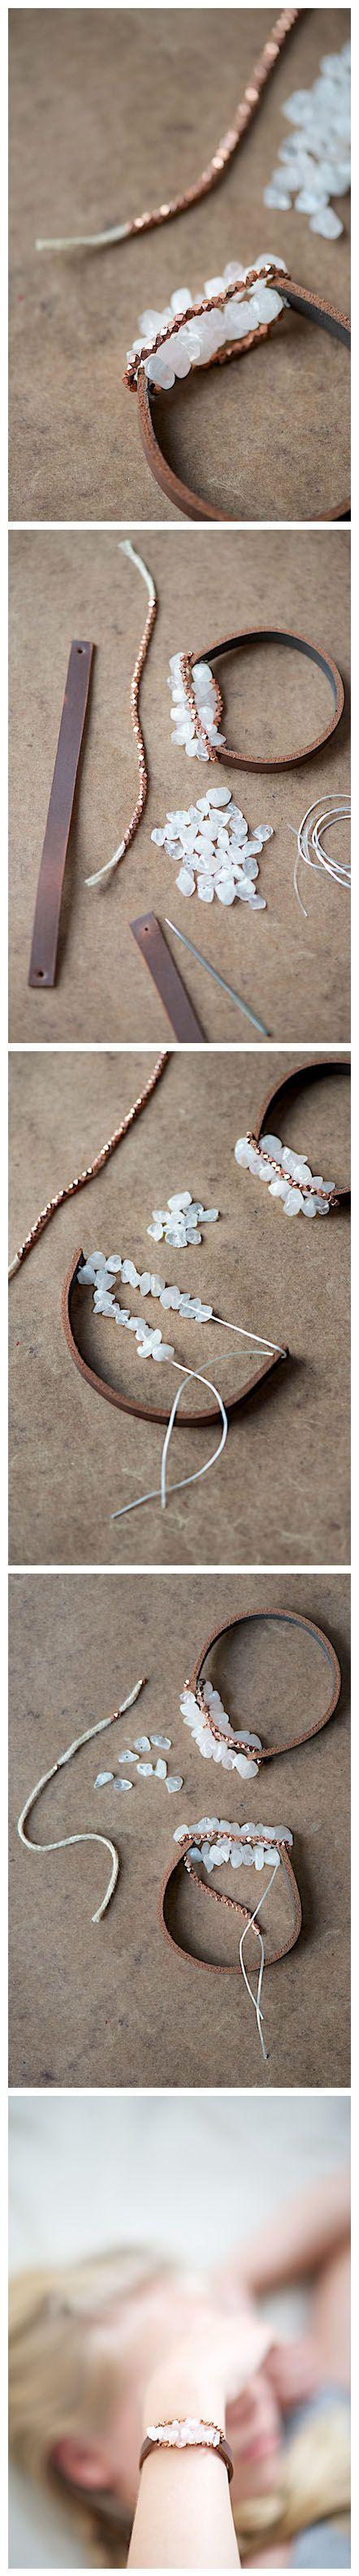 So Beautiful Bracelet   DIY & Crafts